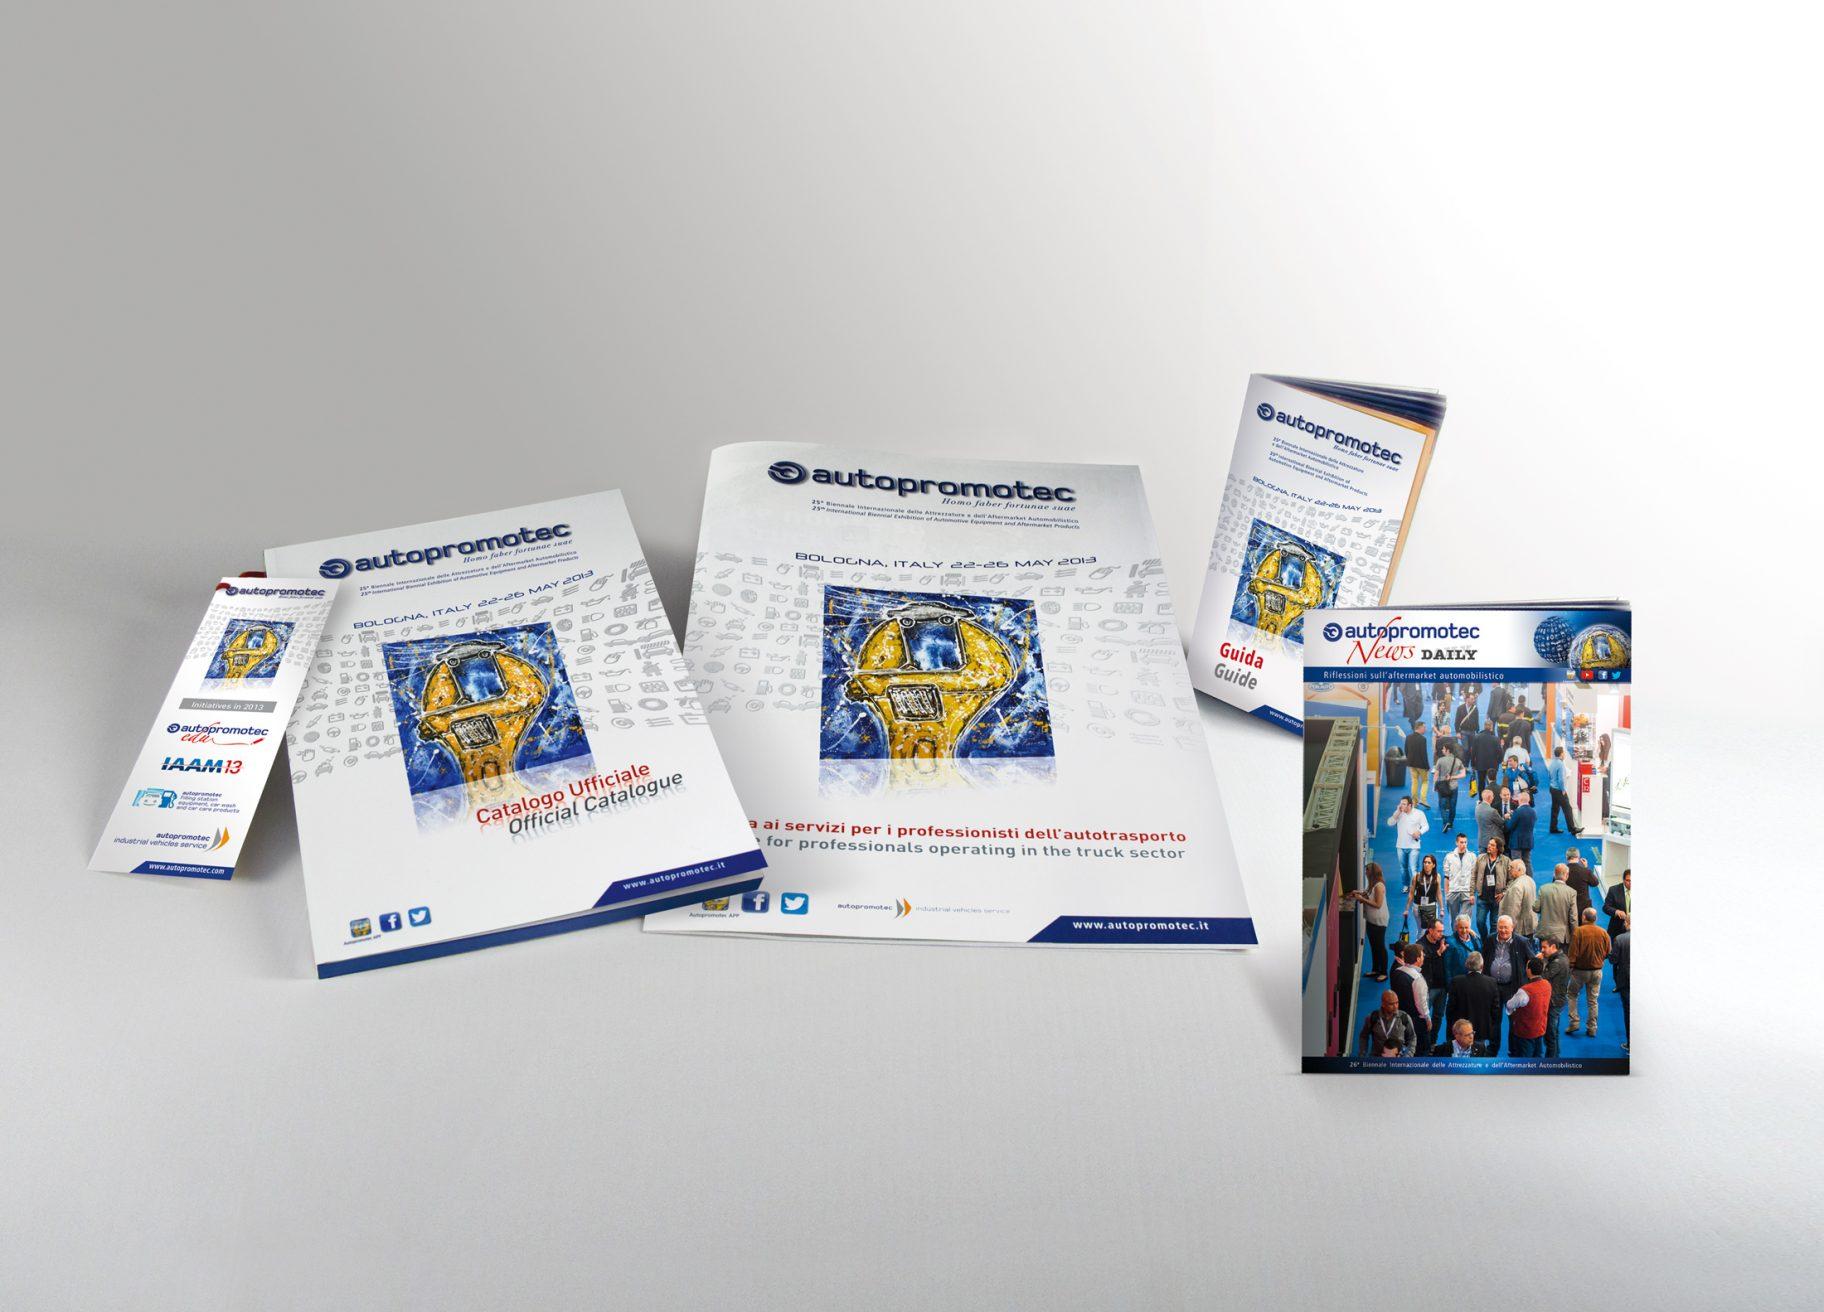 Autopromotec-fiera-2013-pubblicazioni